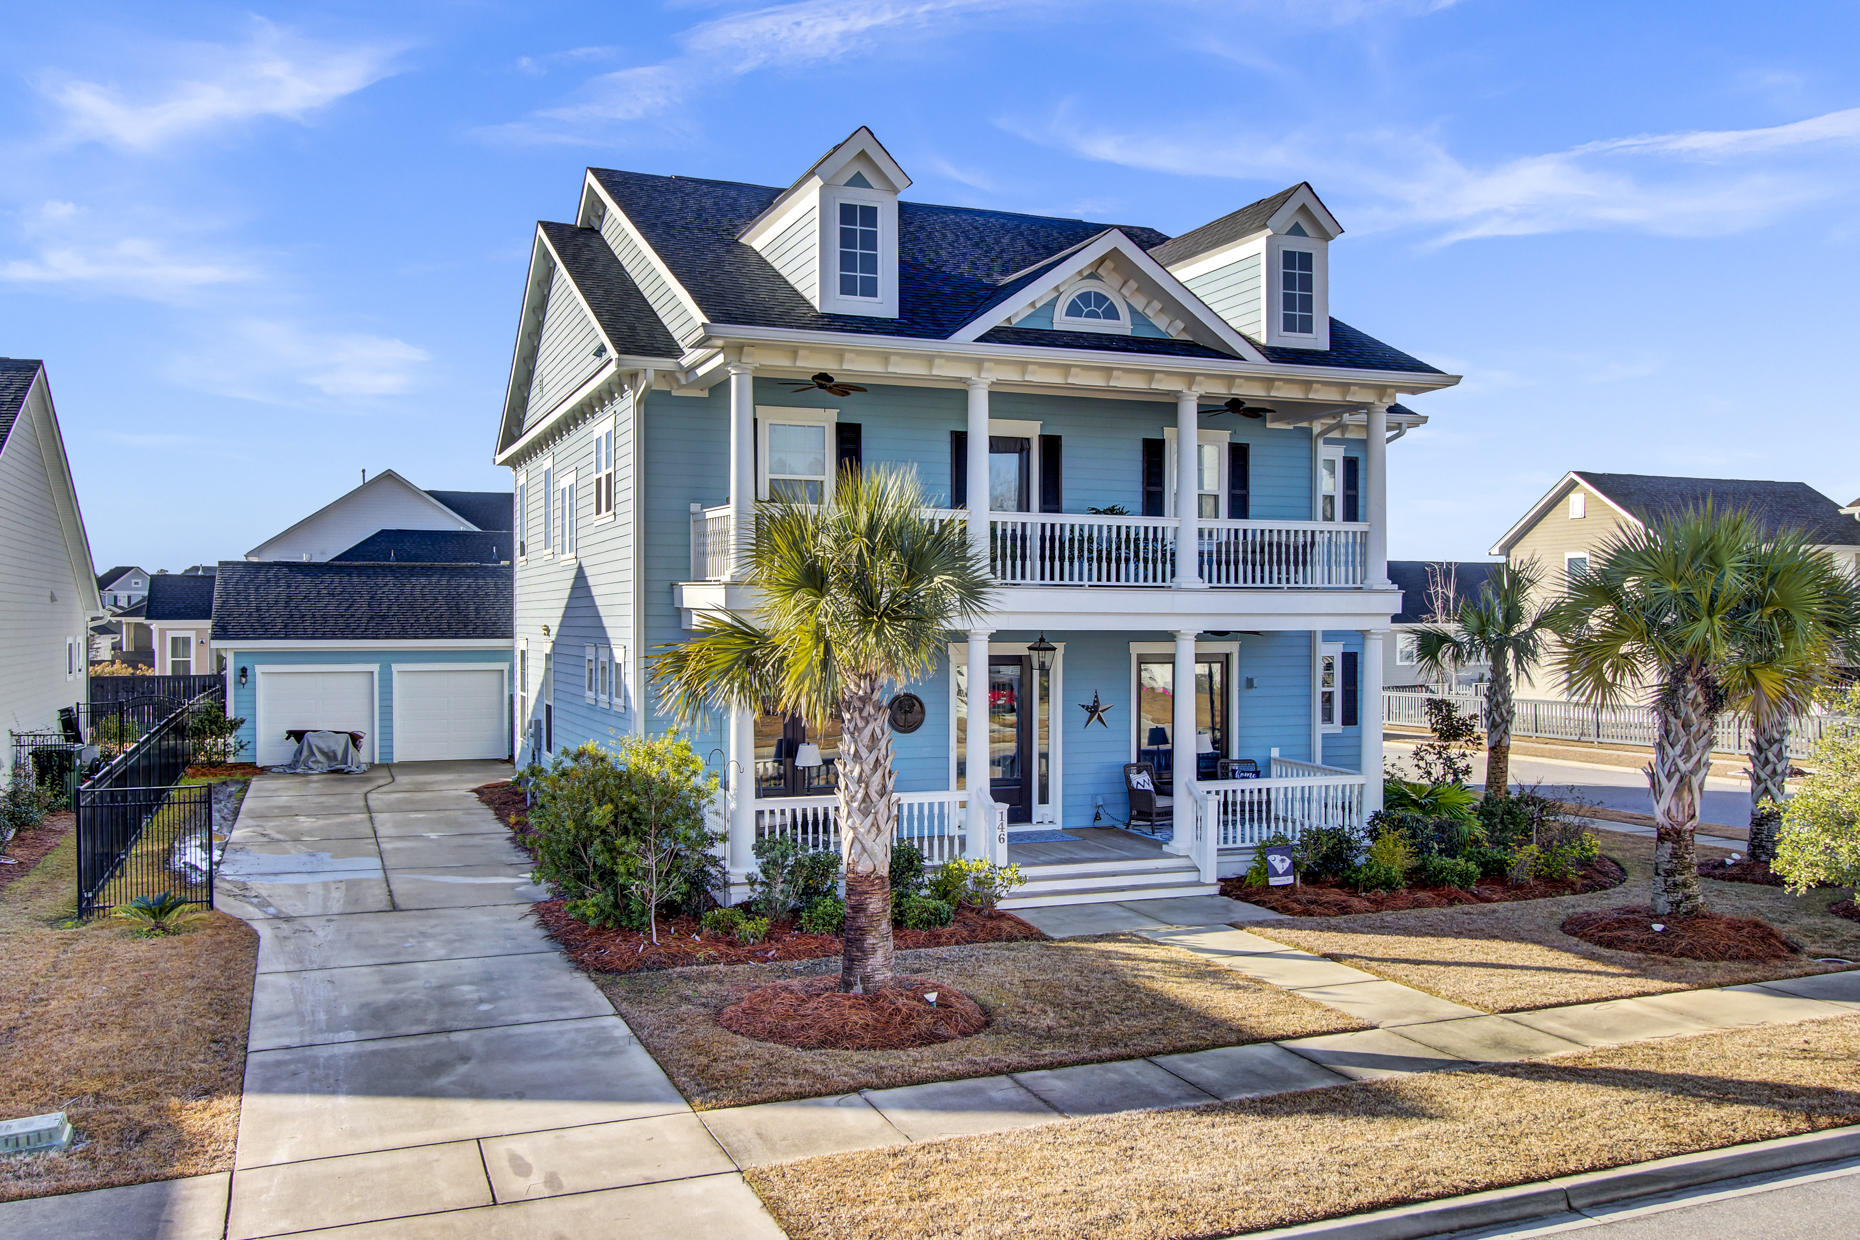 Carnes Crossroads Homes For Sale - 146 Callibluff, Summerville, SC - 9